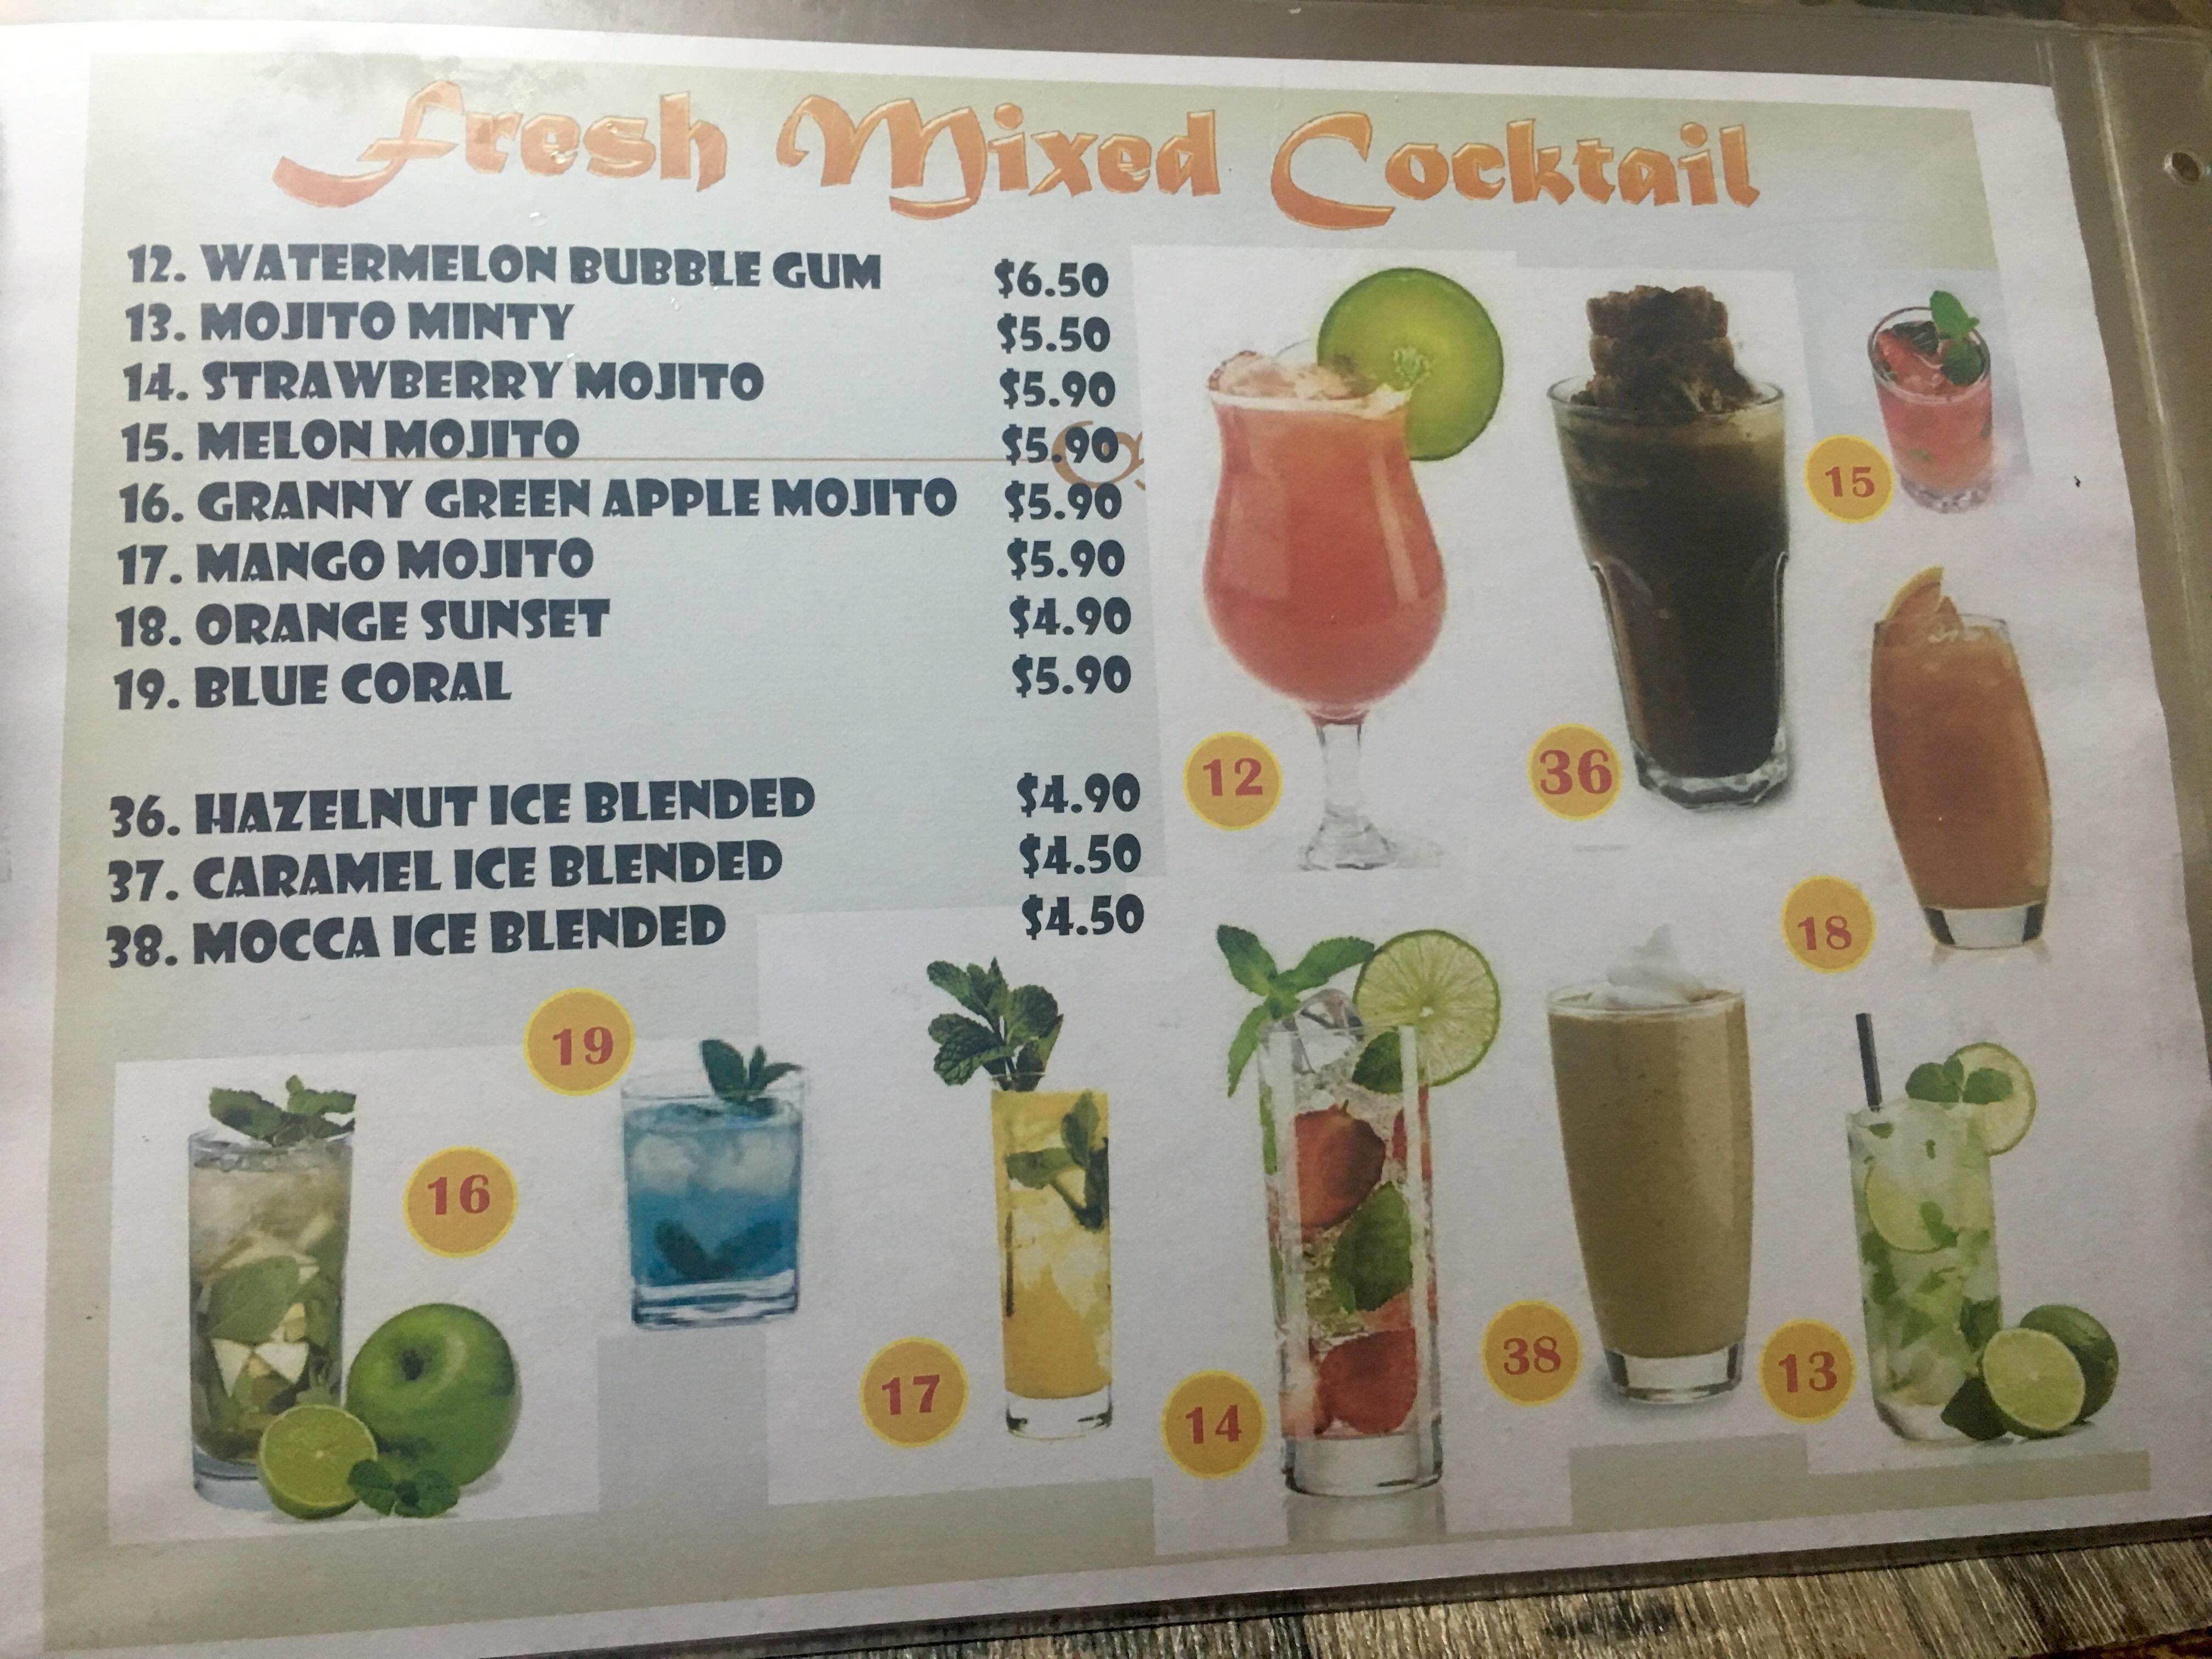 Peachy's Menu Cocktails